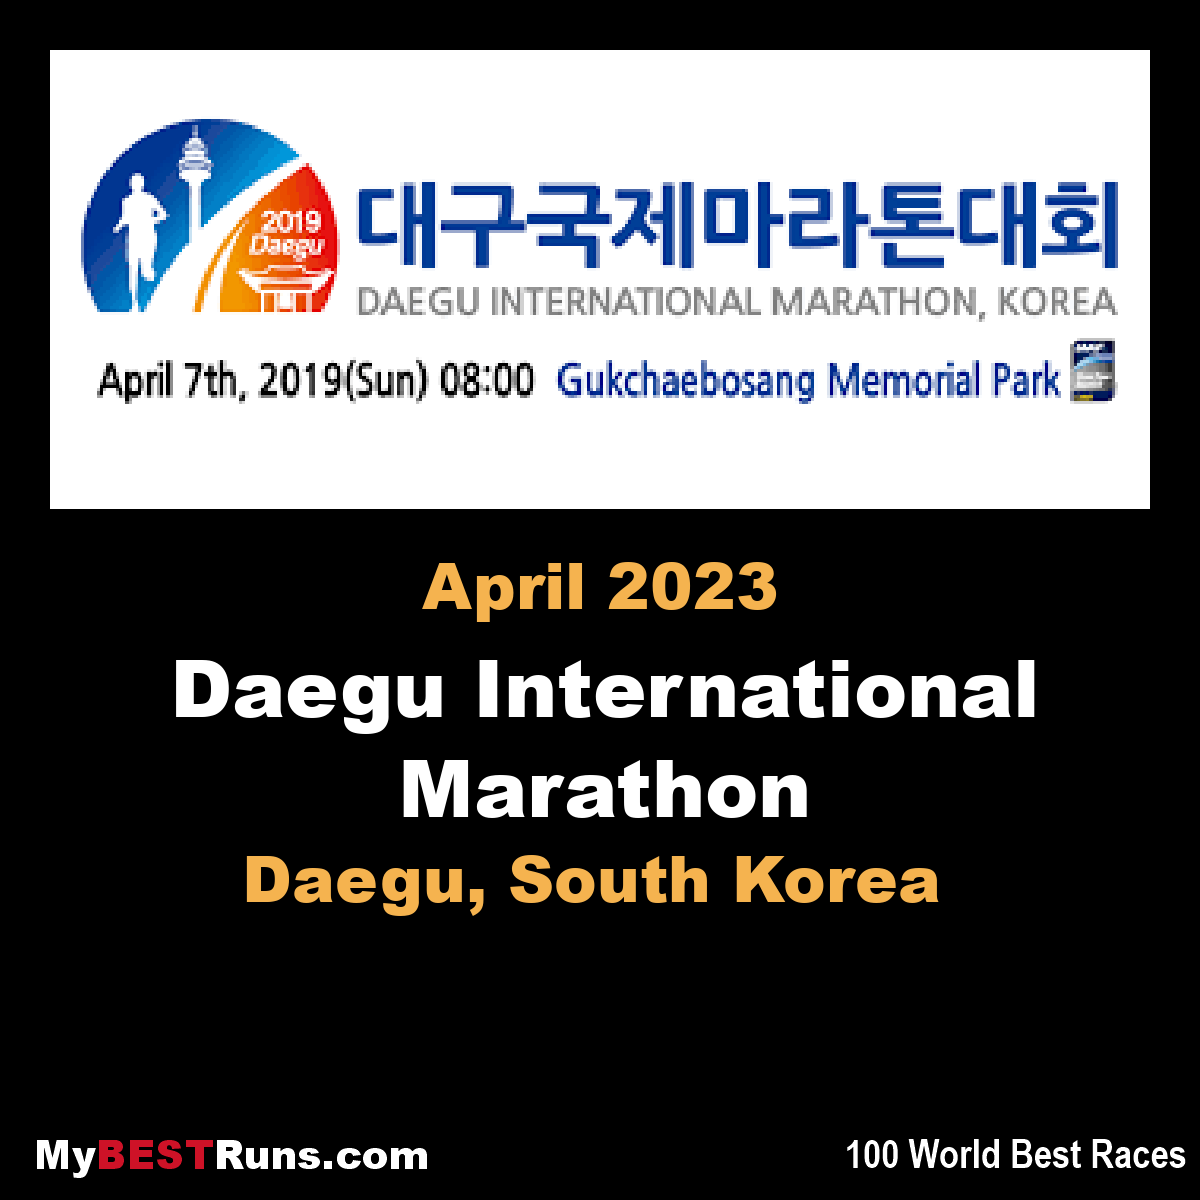 Daegu International Marathon